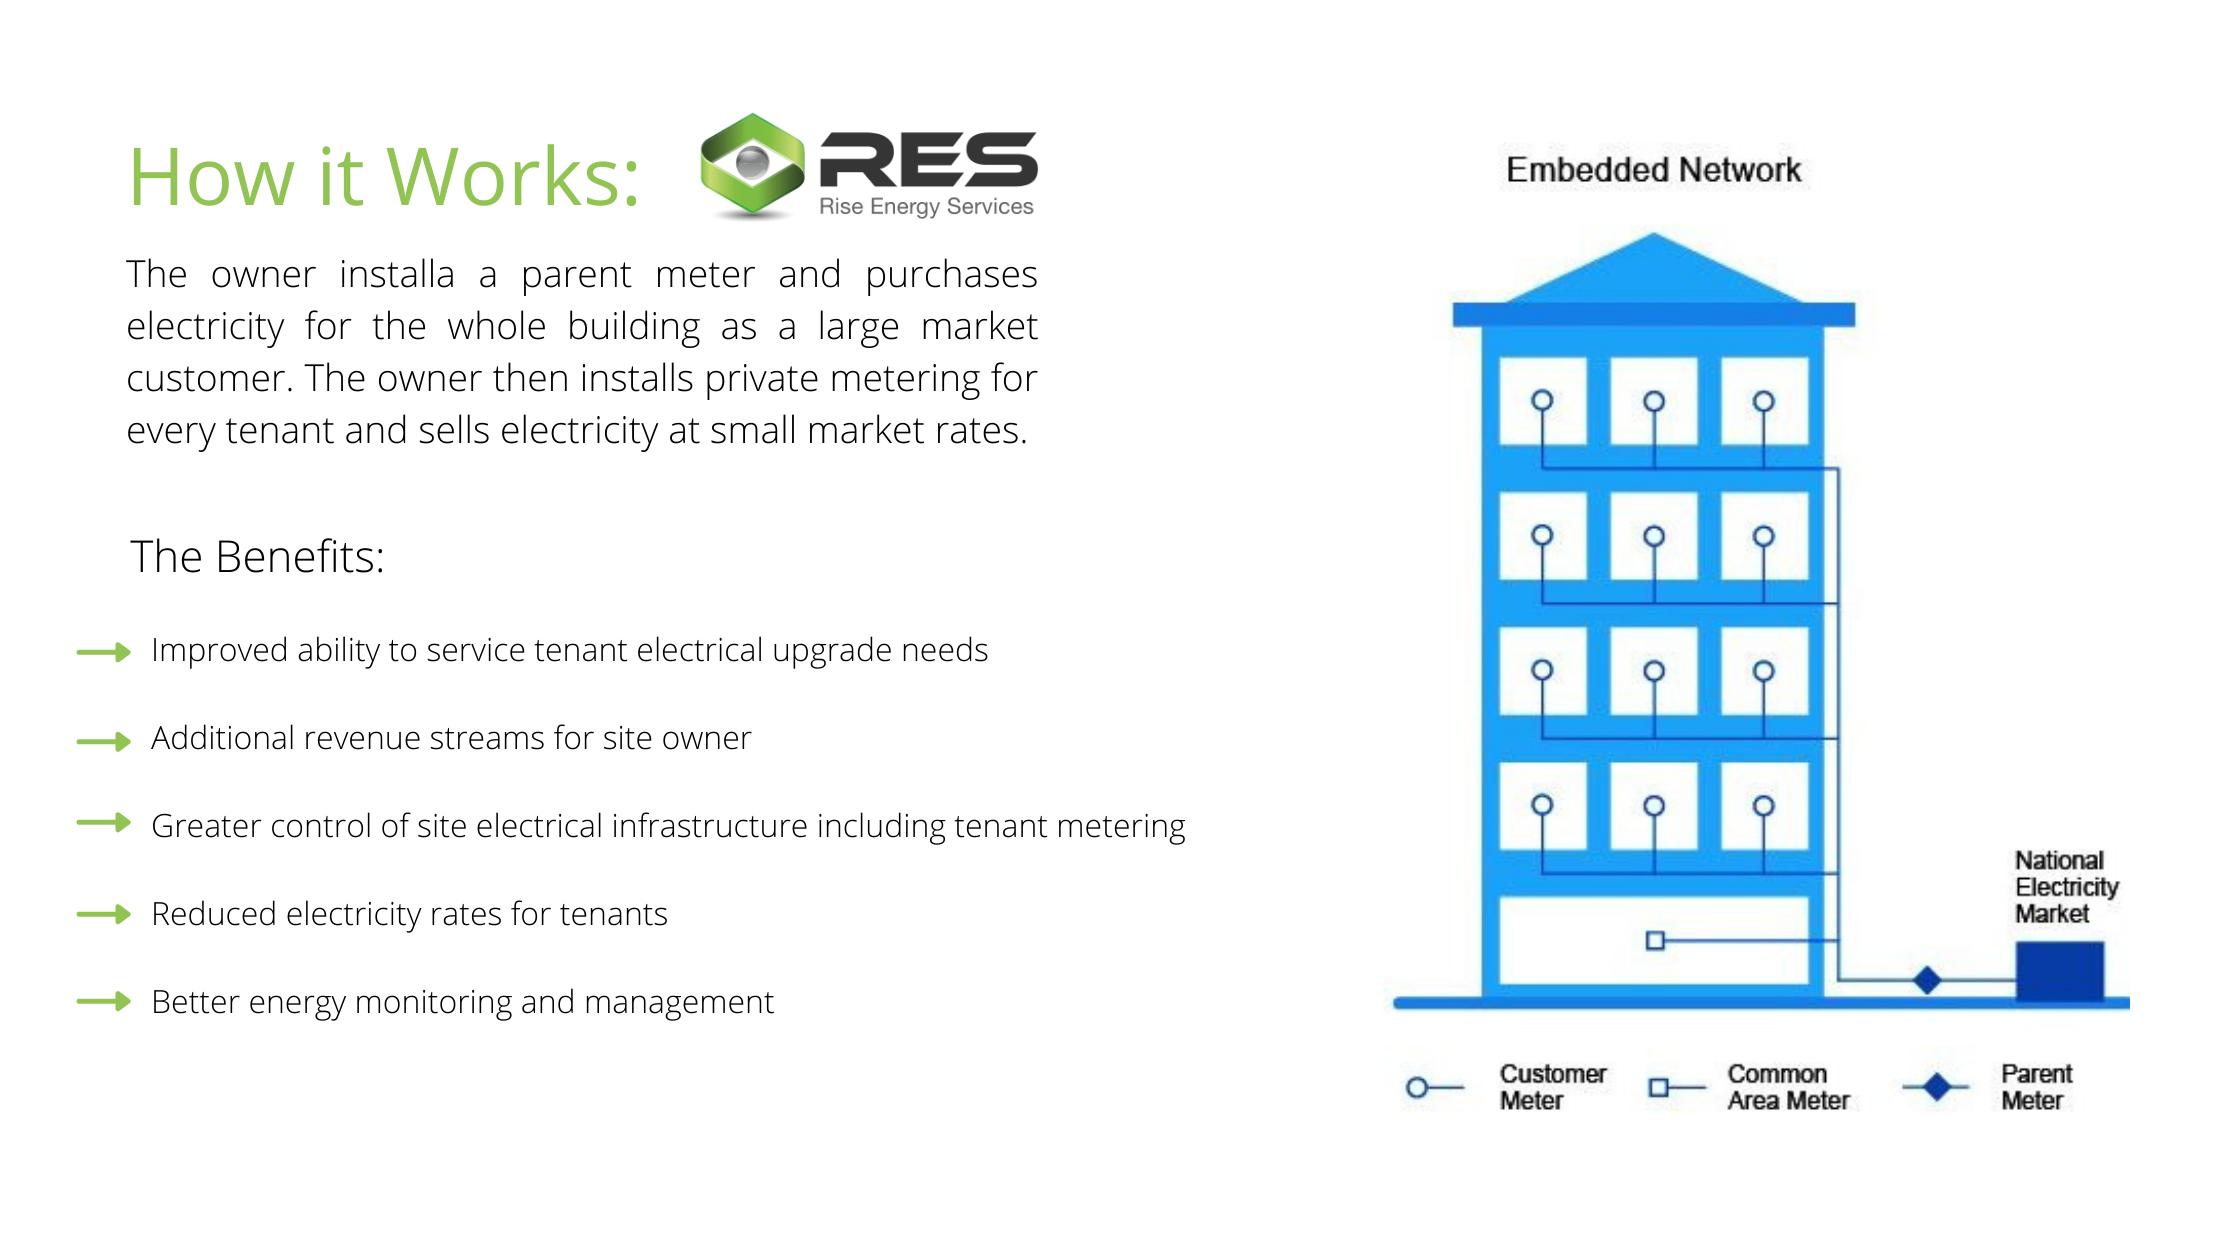 Embedded Network